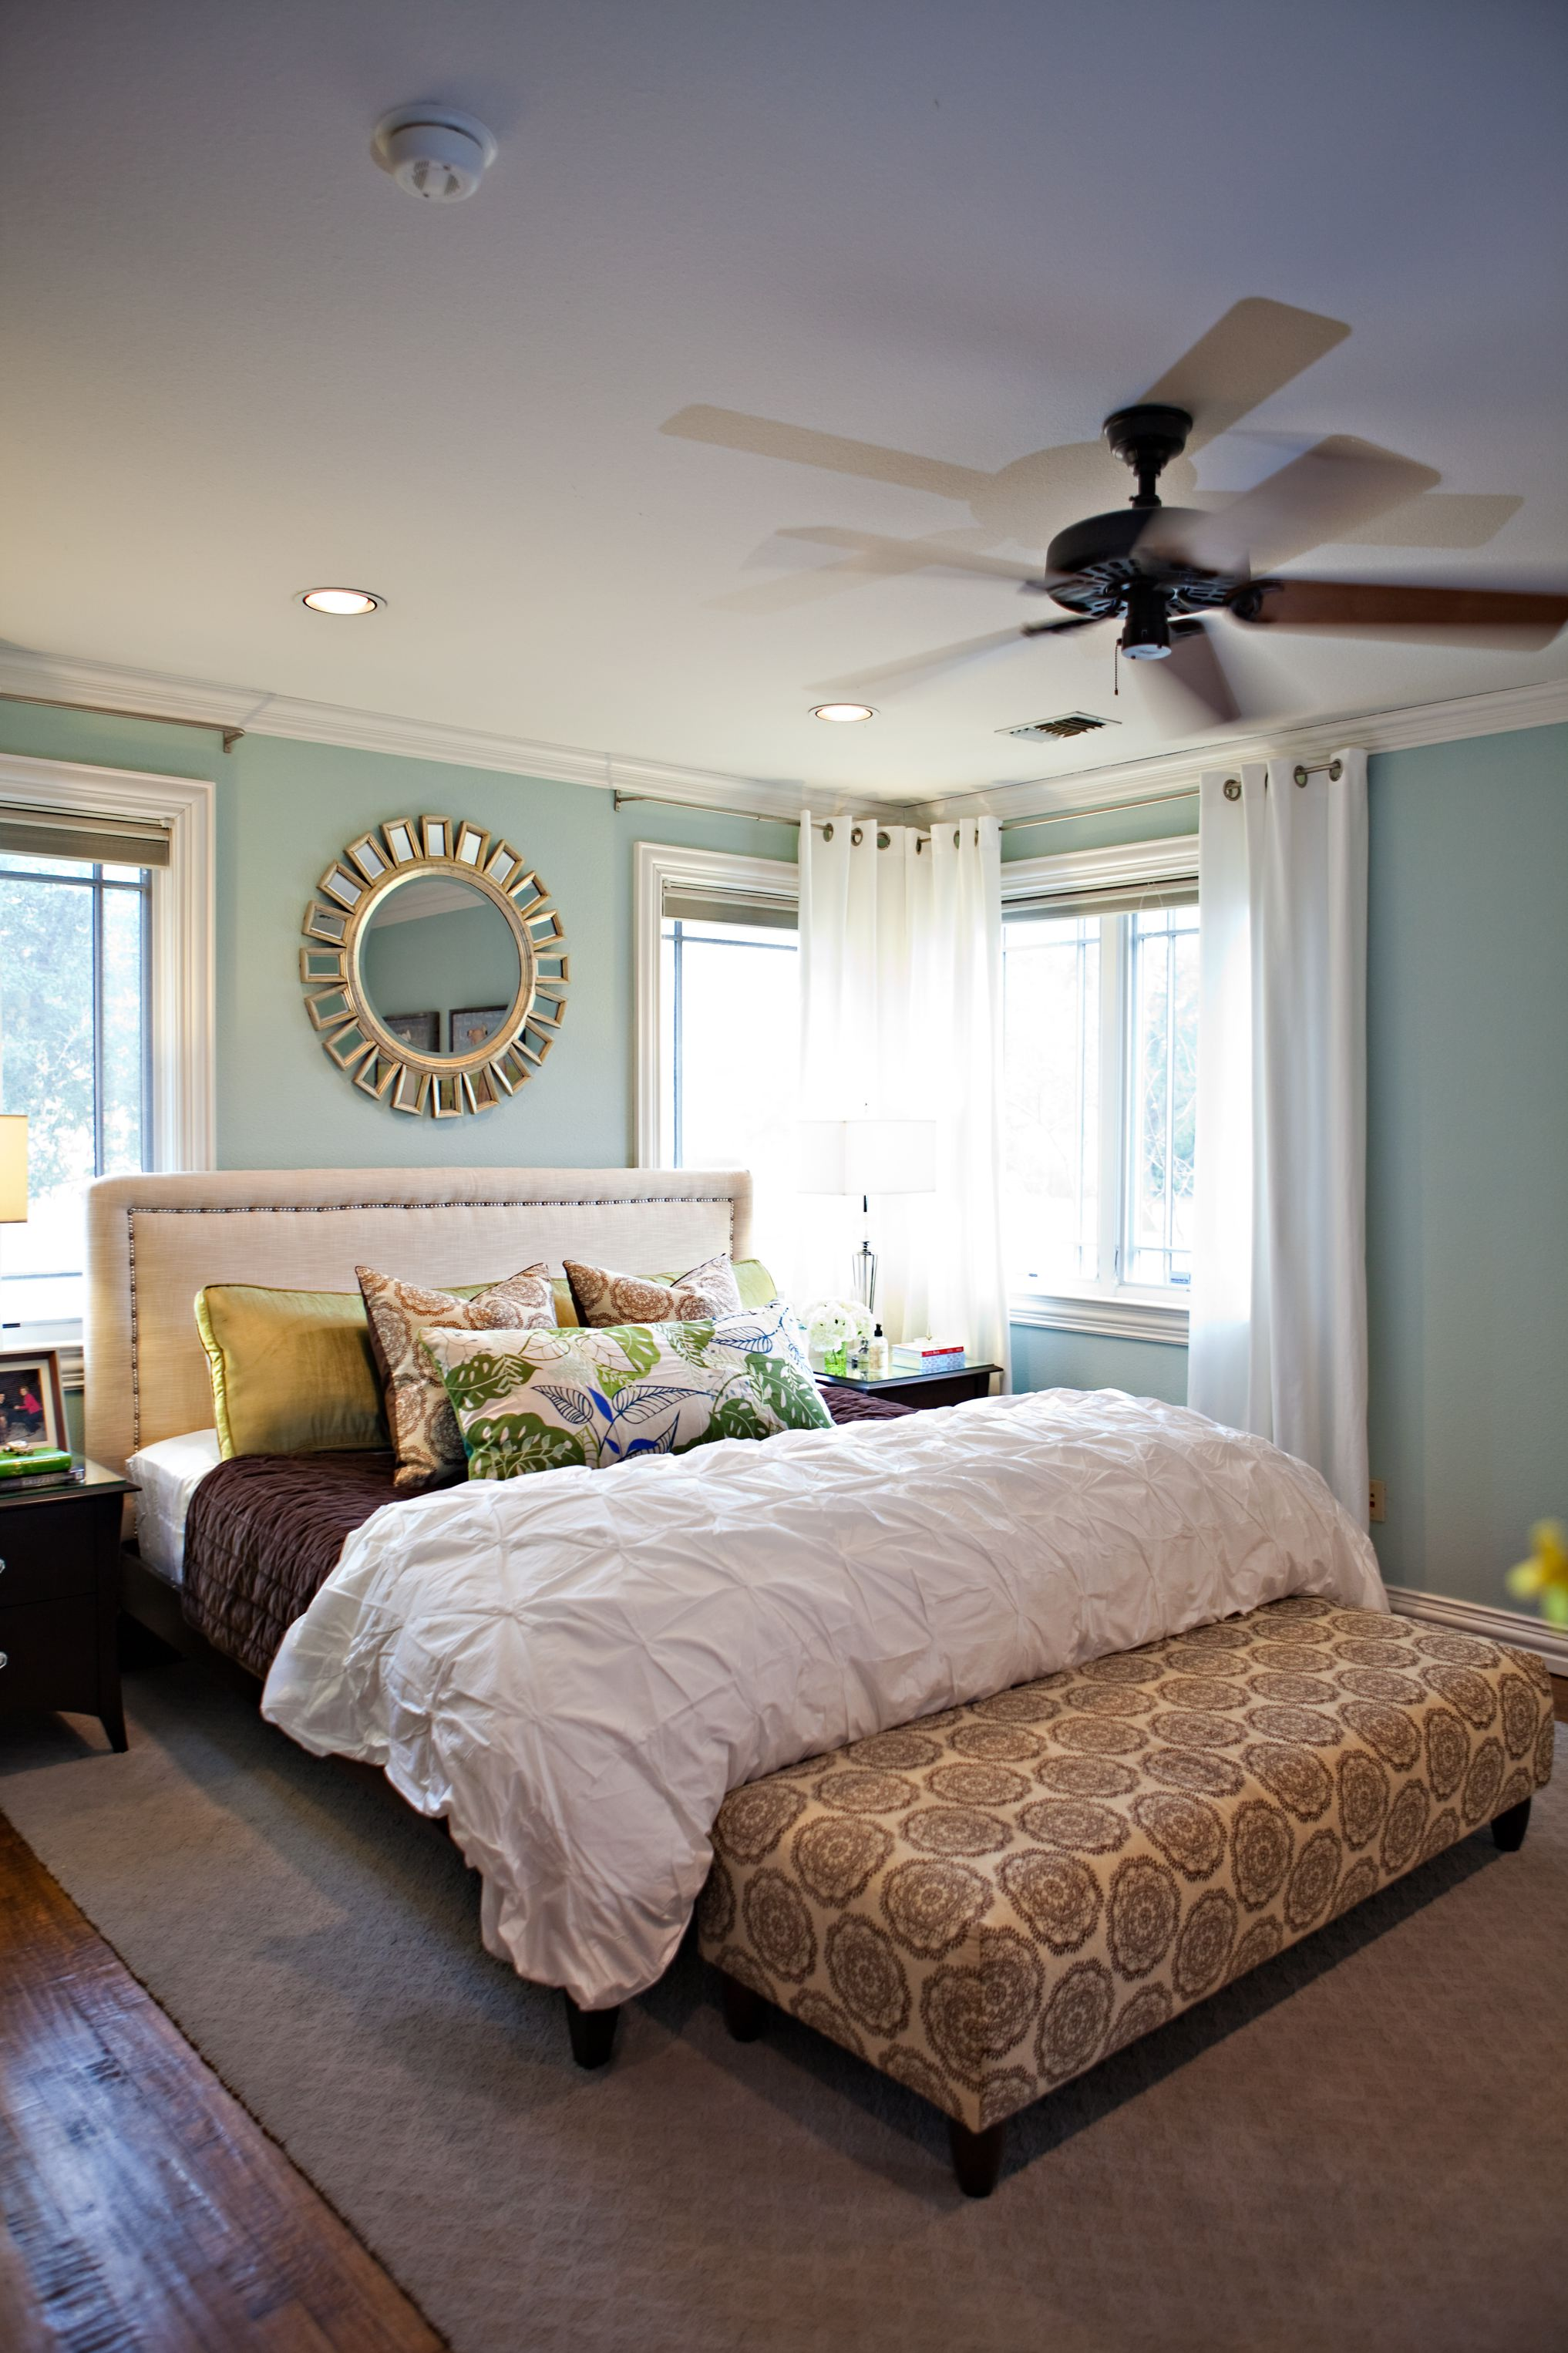 Однотонные подушки и обивка кровати